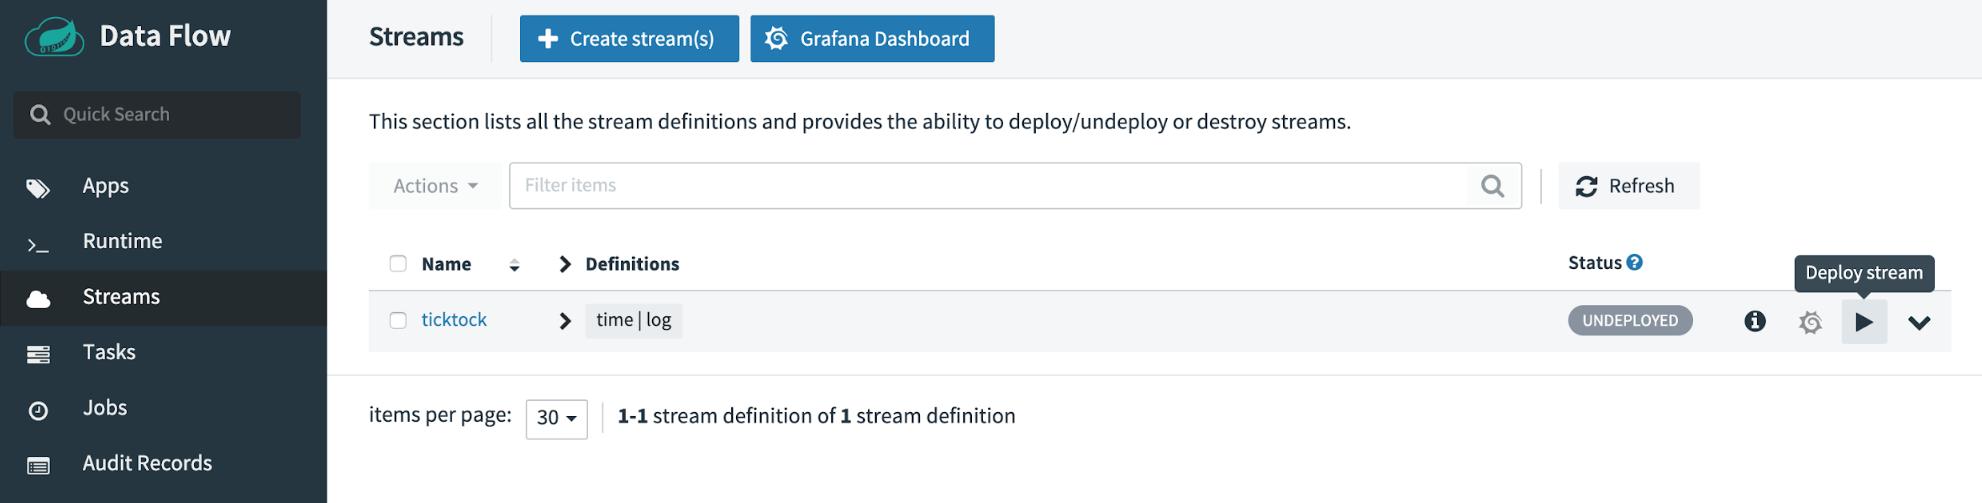 Spring Cloud Data Flow   Streams   Grafana Dashboard